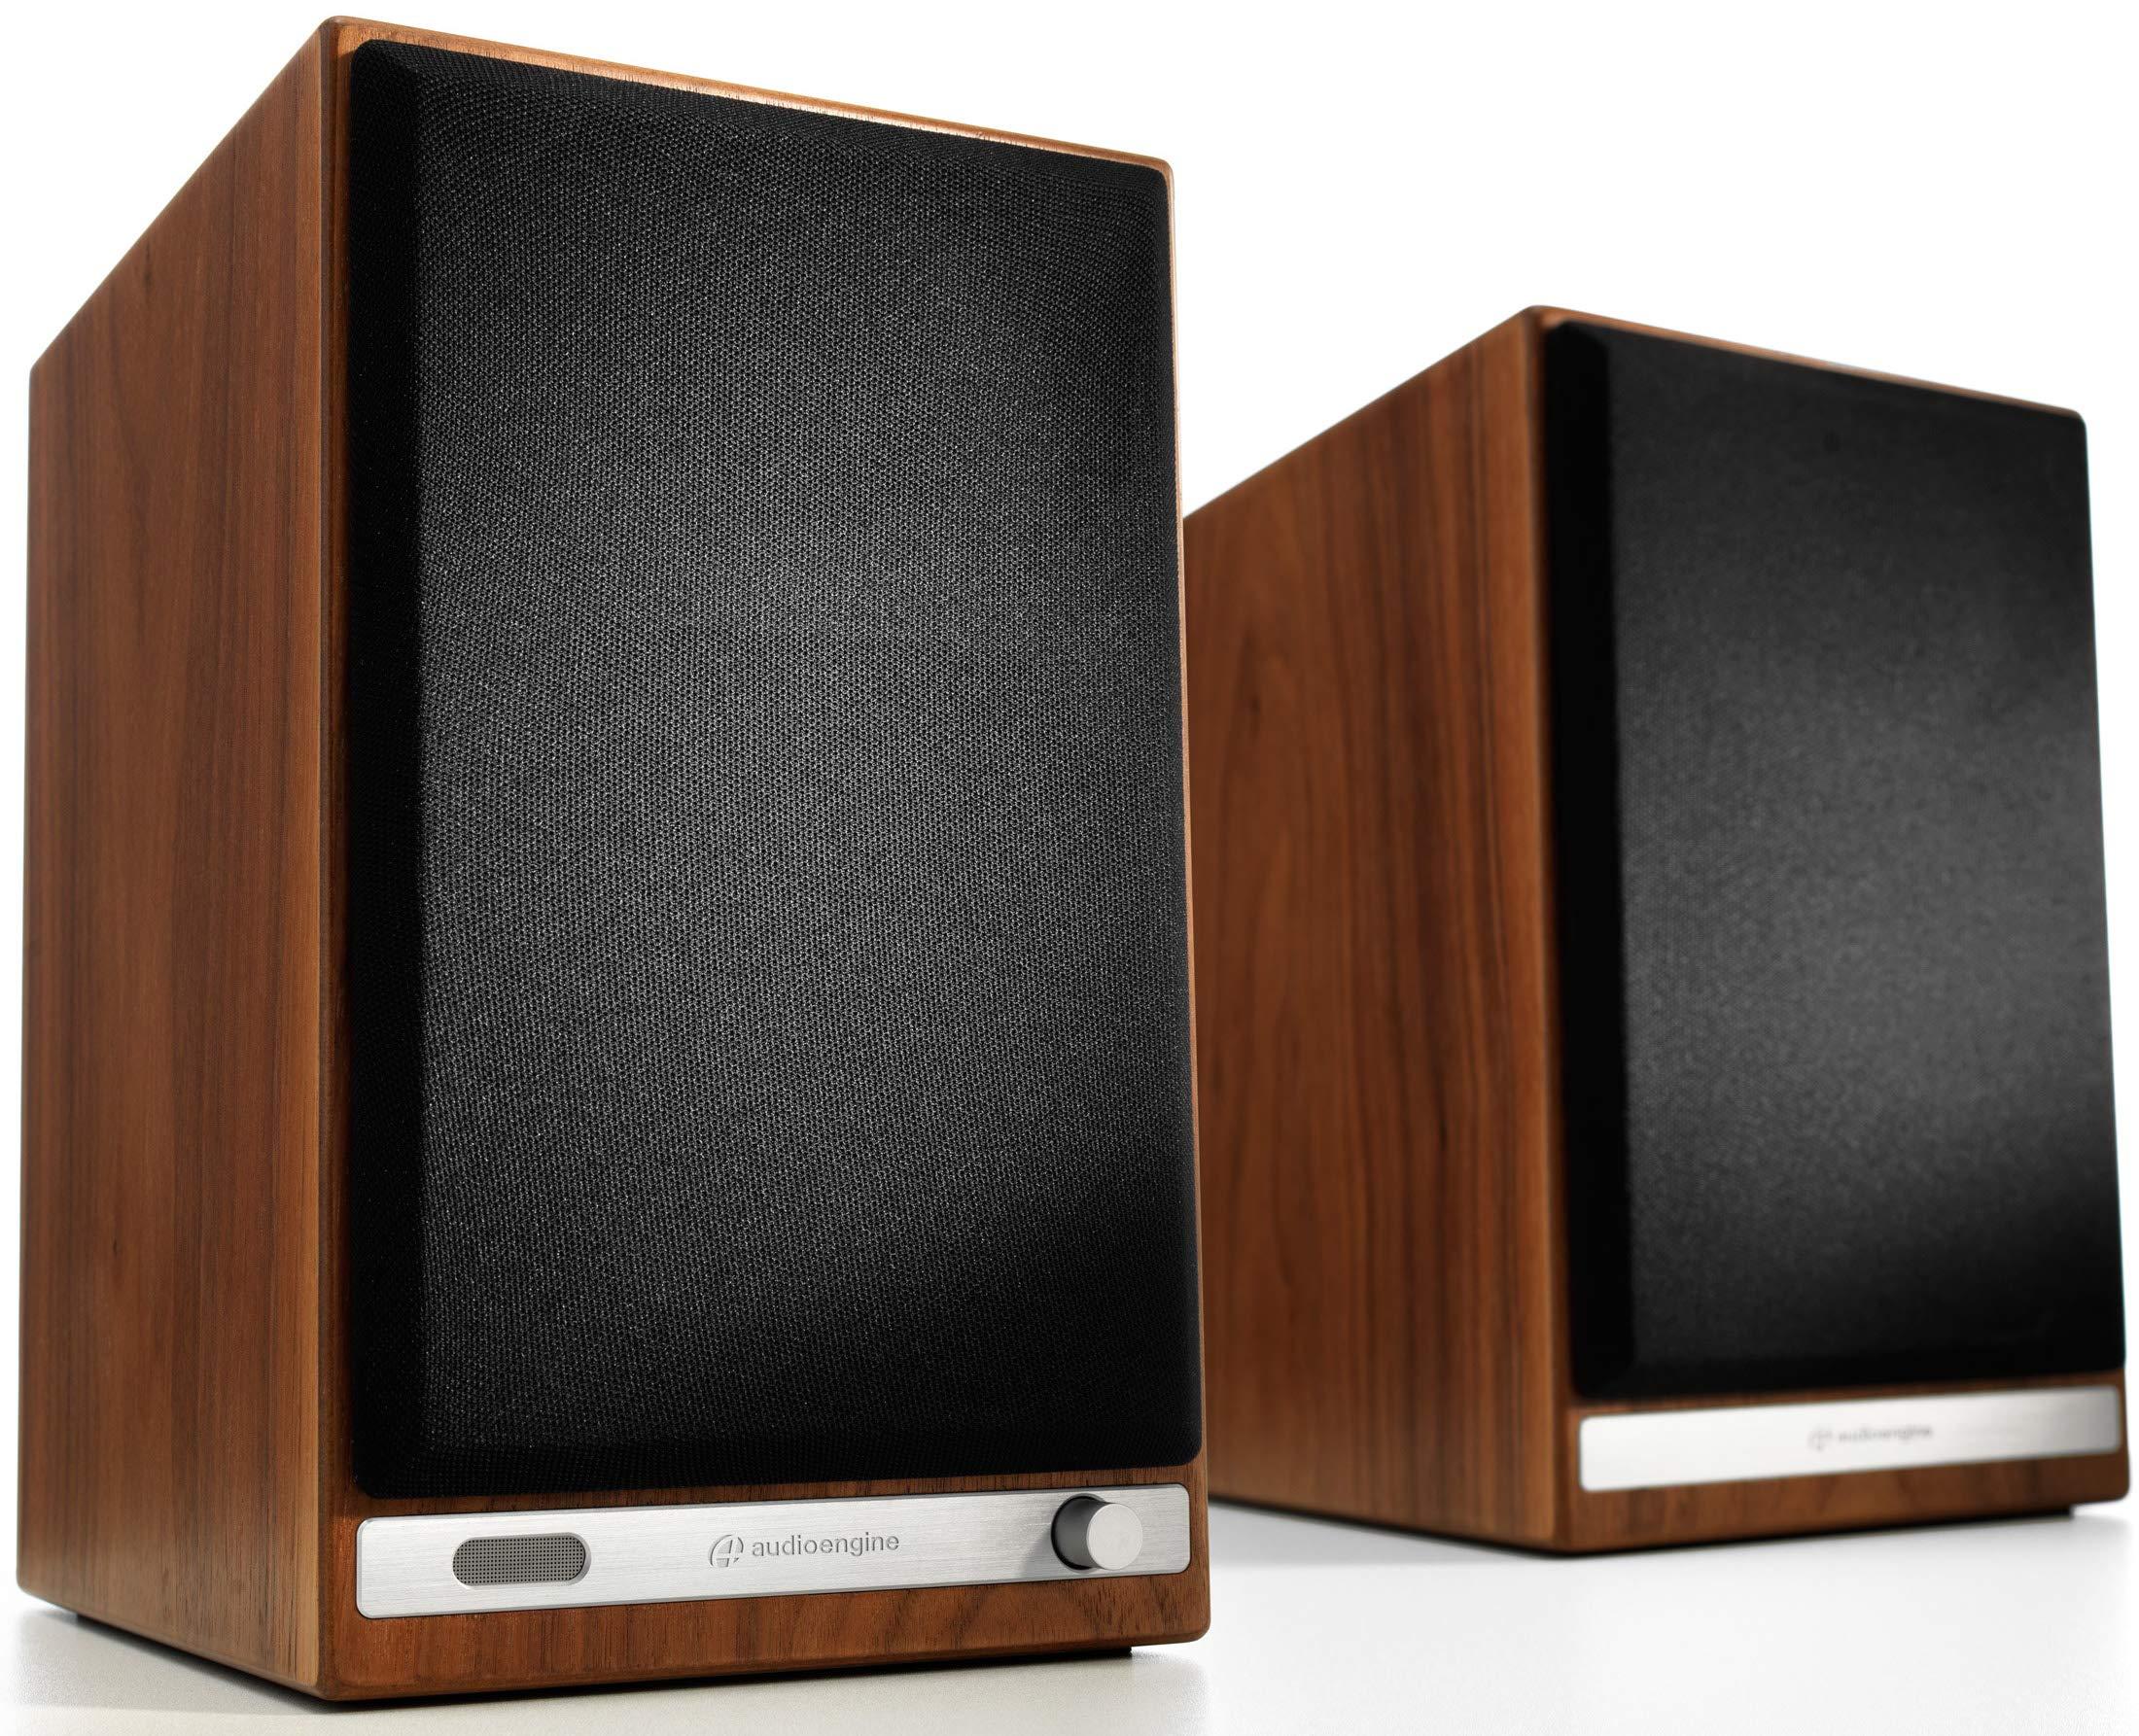 Audioengine HD6 Wireless Speakers, Powered Bluetooth Speakers (Pair) Walnut